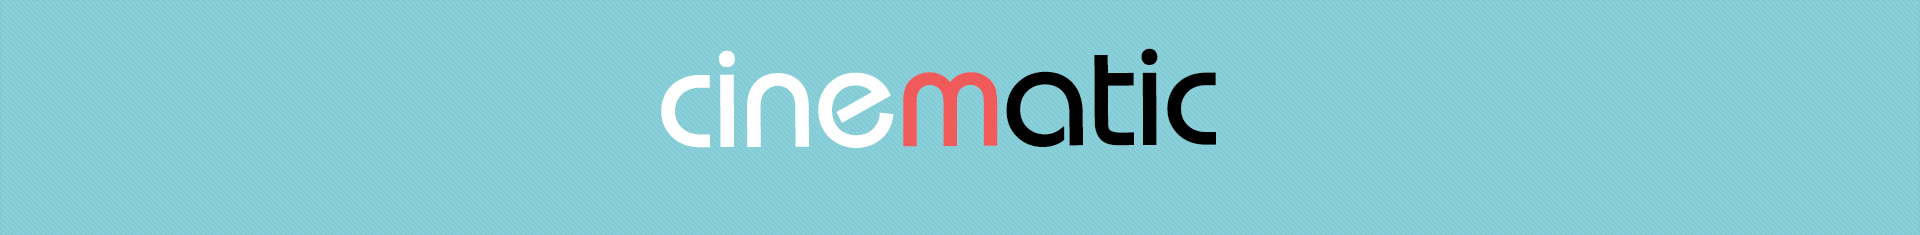 Emotional Motivation Technology Corporate - 3